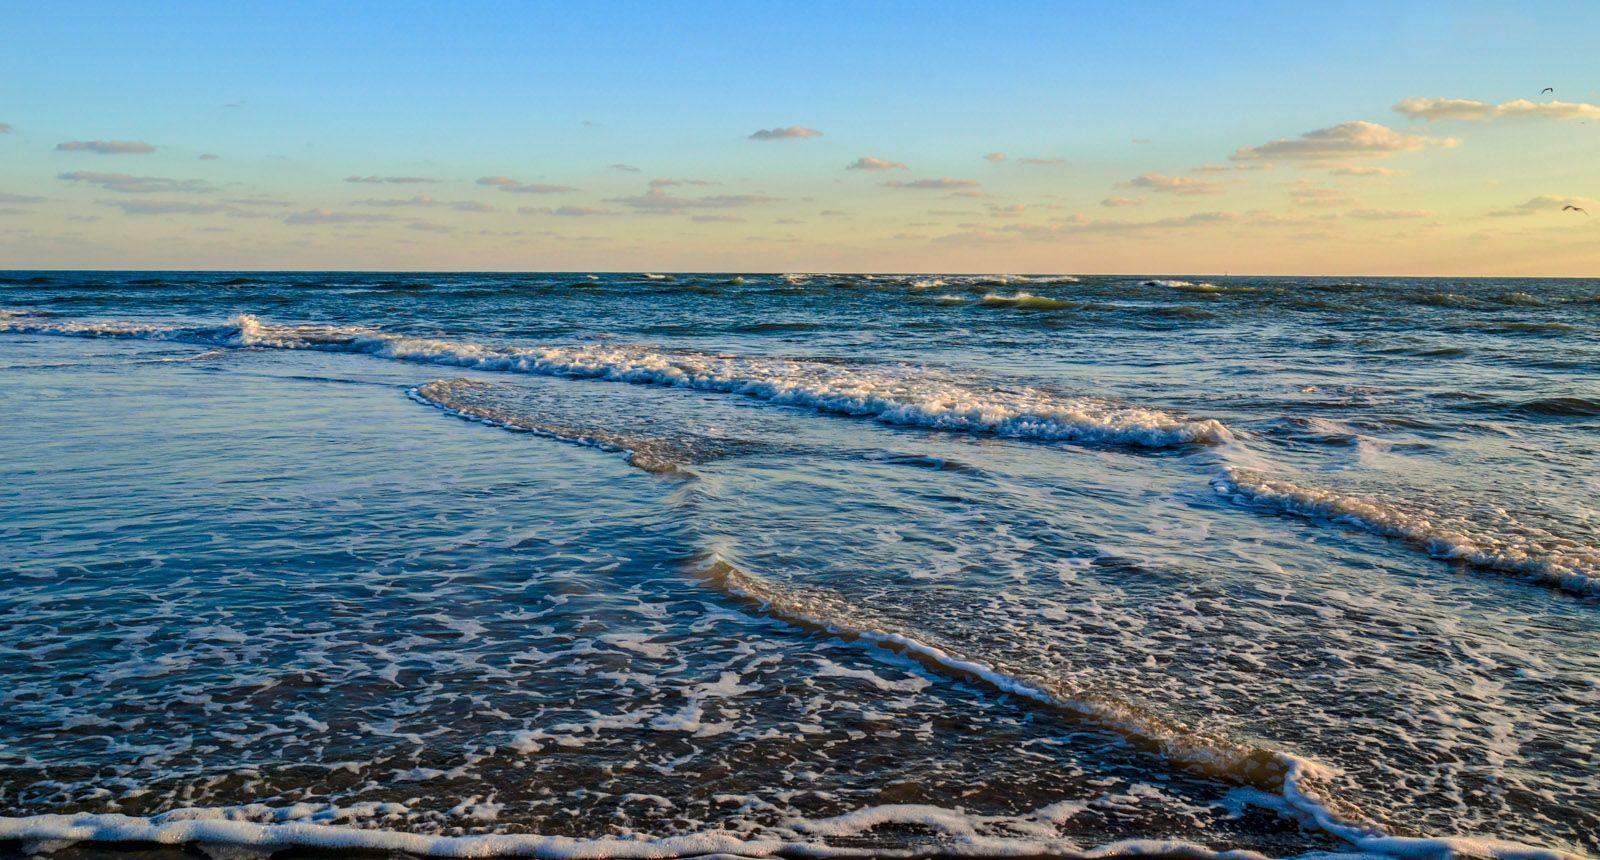 November evening on the beach near the Point on Emerald Isle, NC